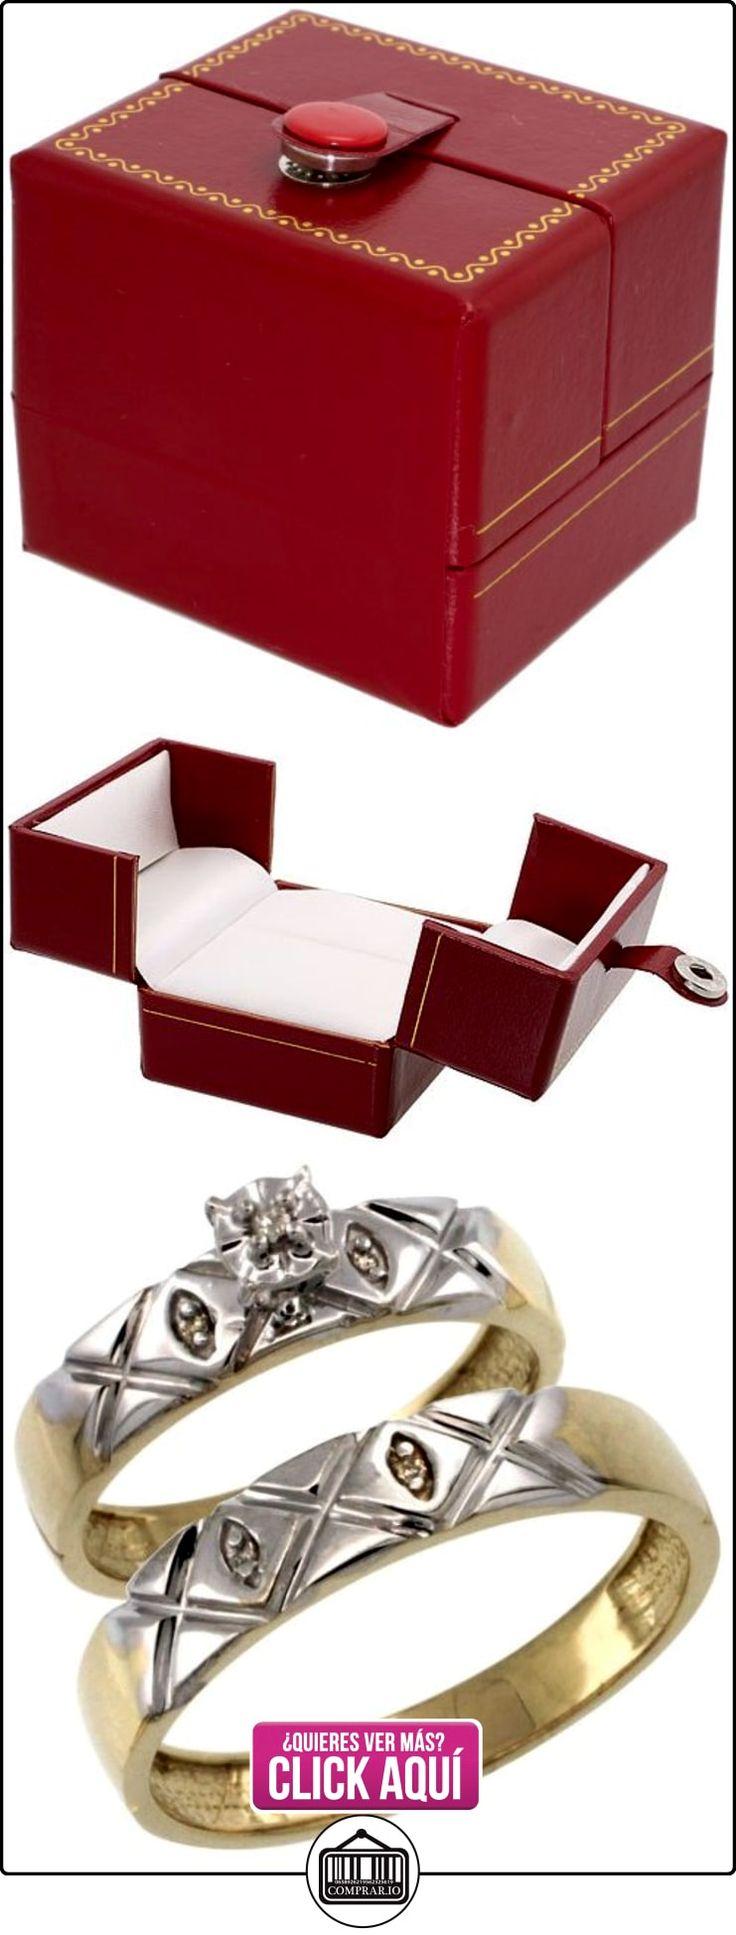 Revoni - Anillo de compromiso de oro amarillo  ✿ Joyas para hombres especiales - lujo ✿ ▬► Ver oferta: http://comprar.io/goto/B005NWGSSS